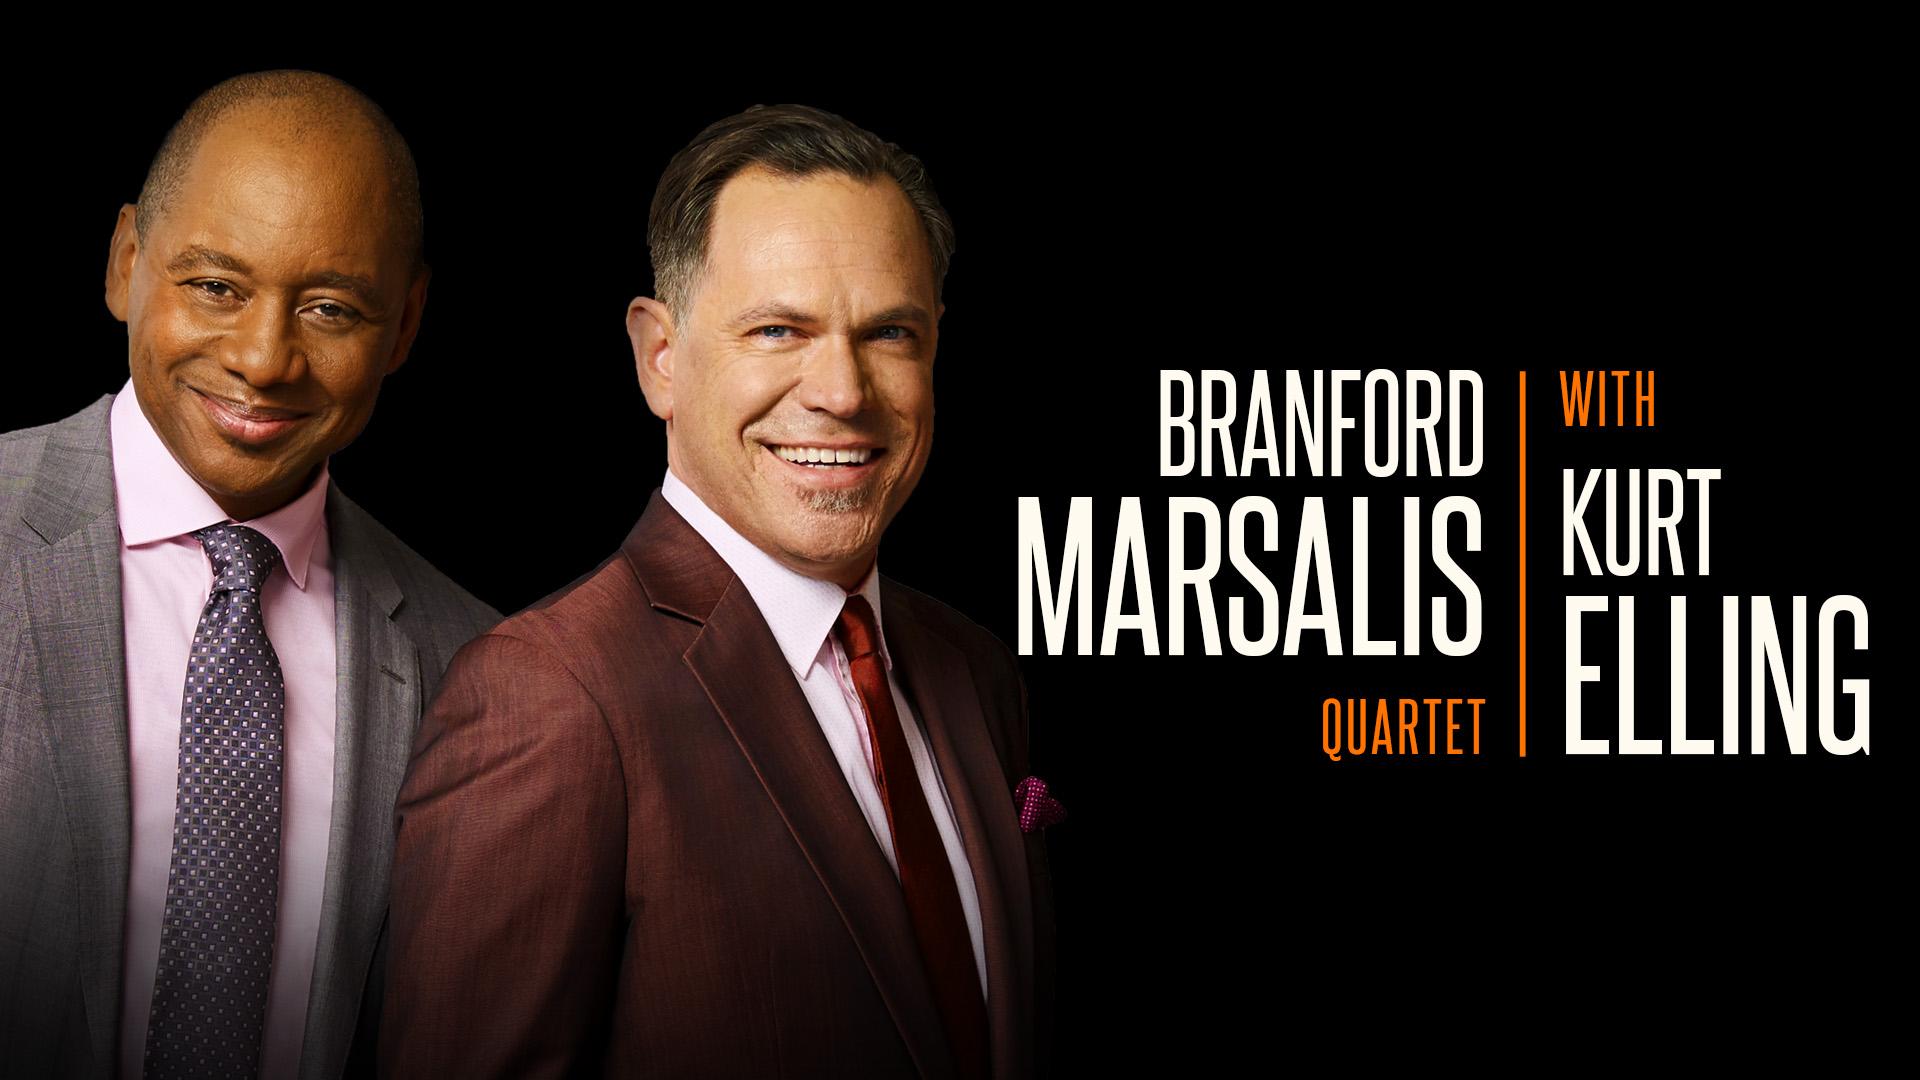 Branford Marsalis Kurt Elling Festival Internazionale Jazz La Spezia